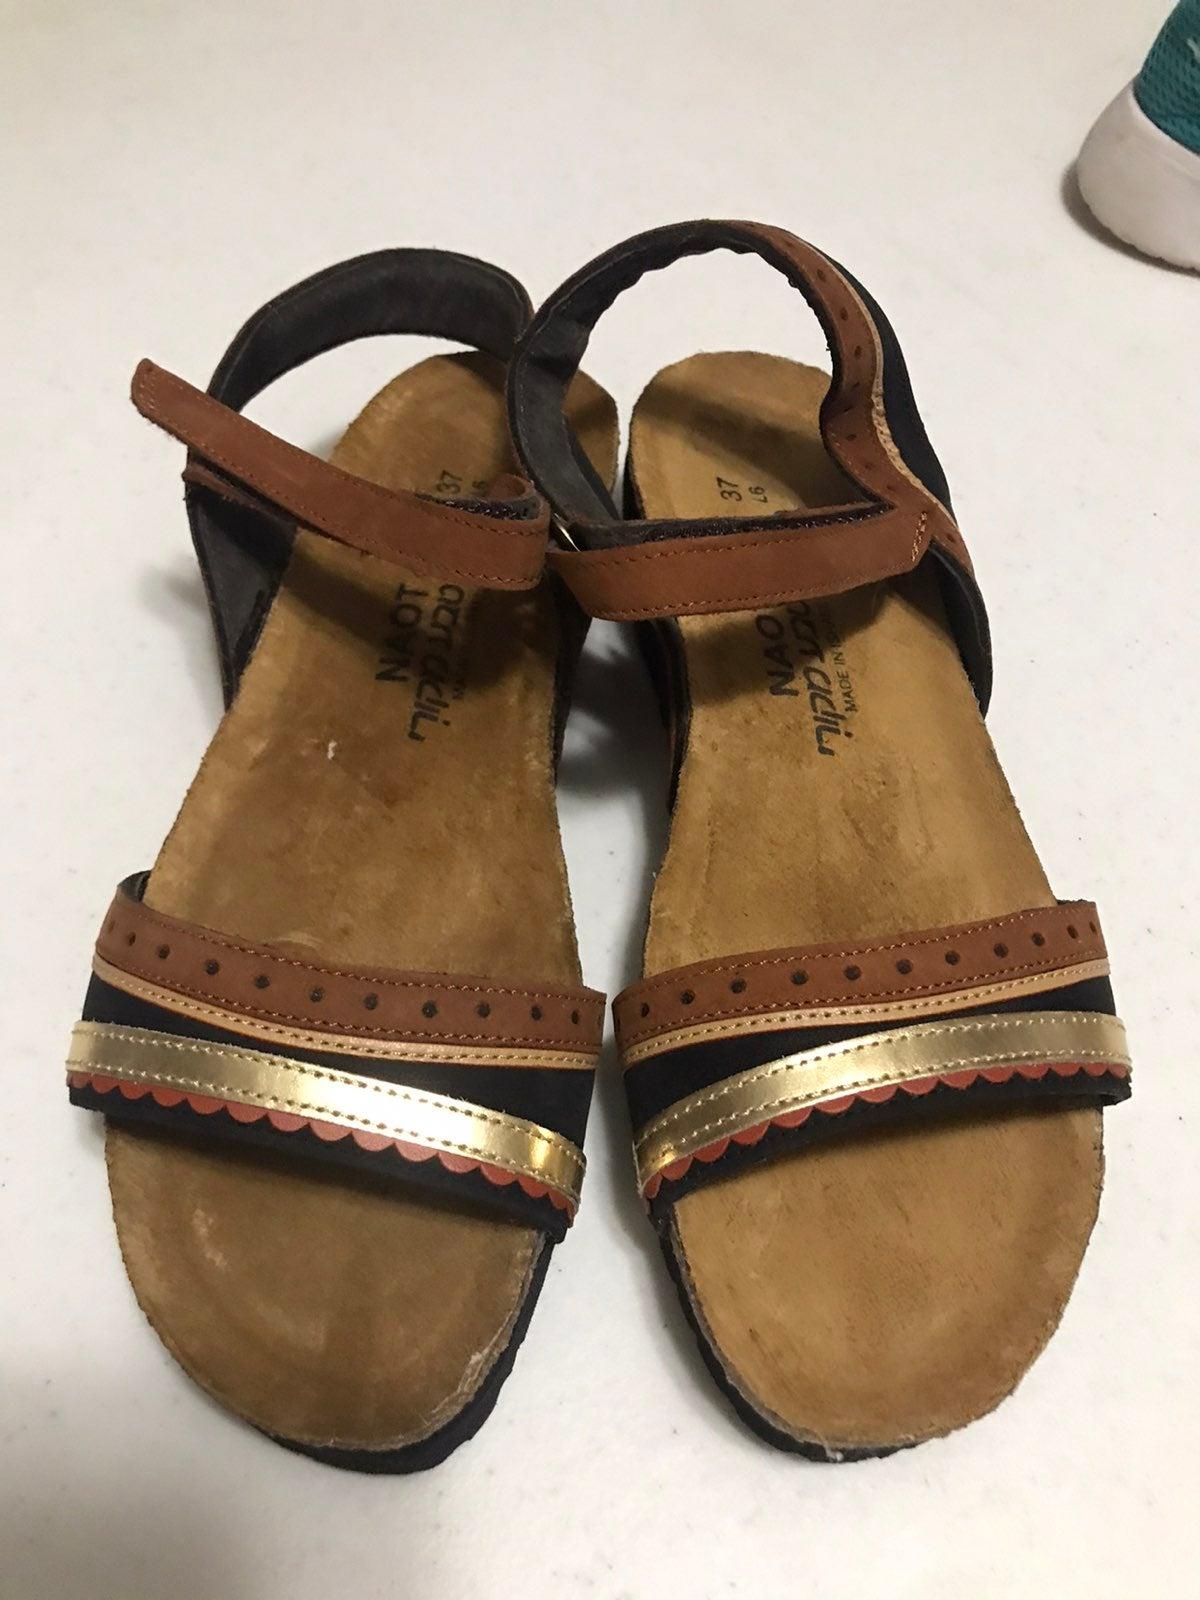 Naot sandal size 37(6)